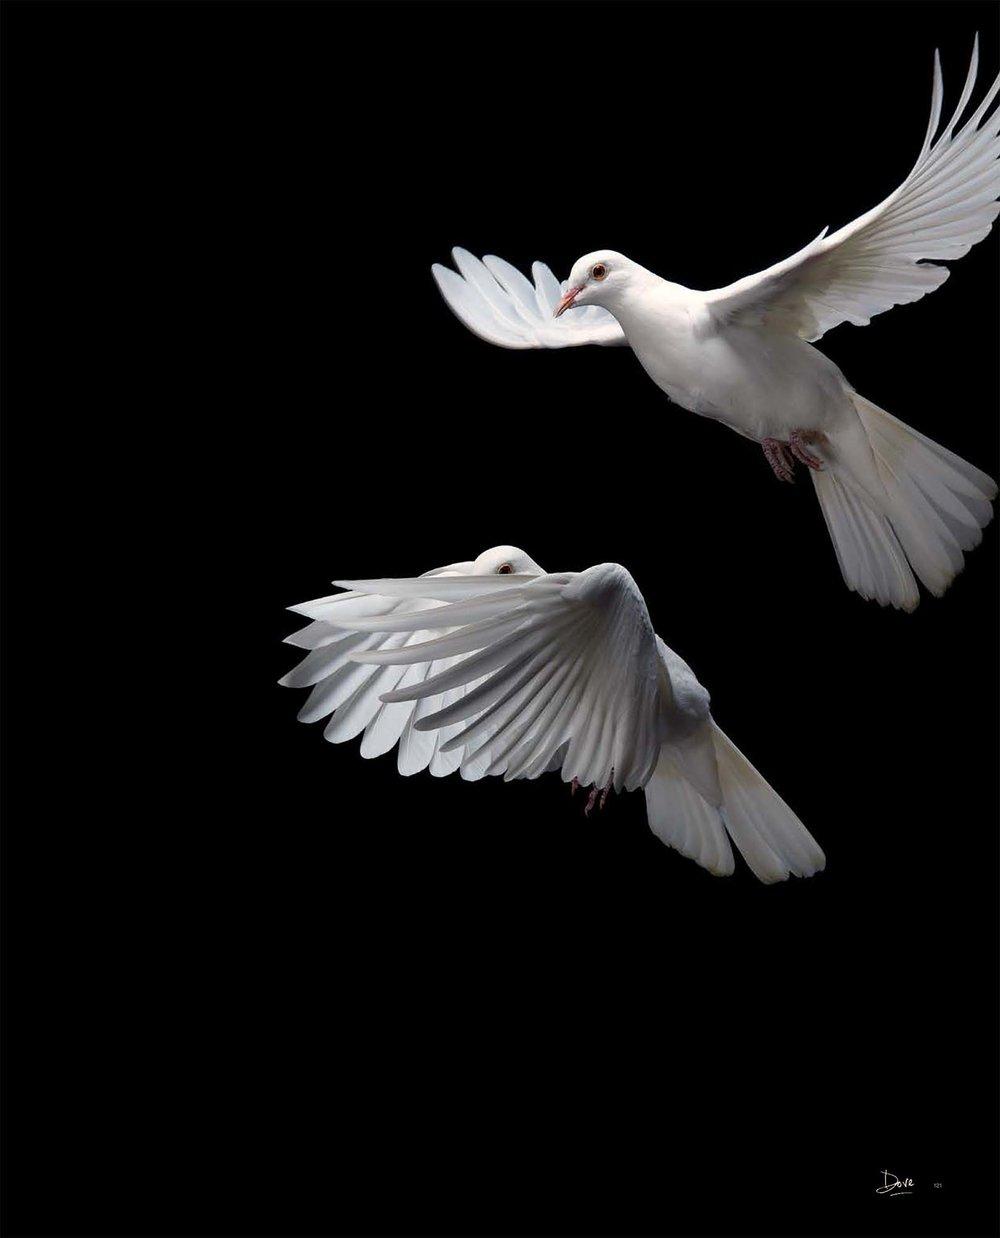 BIRD Gary Heery Book-completemmockup-123.jpg